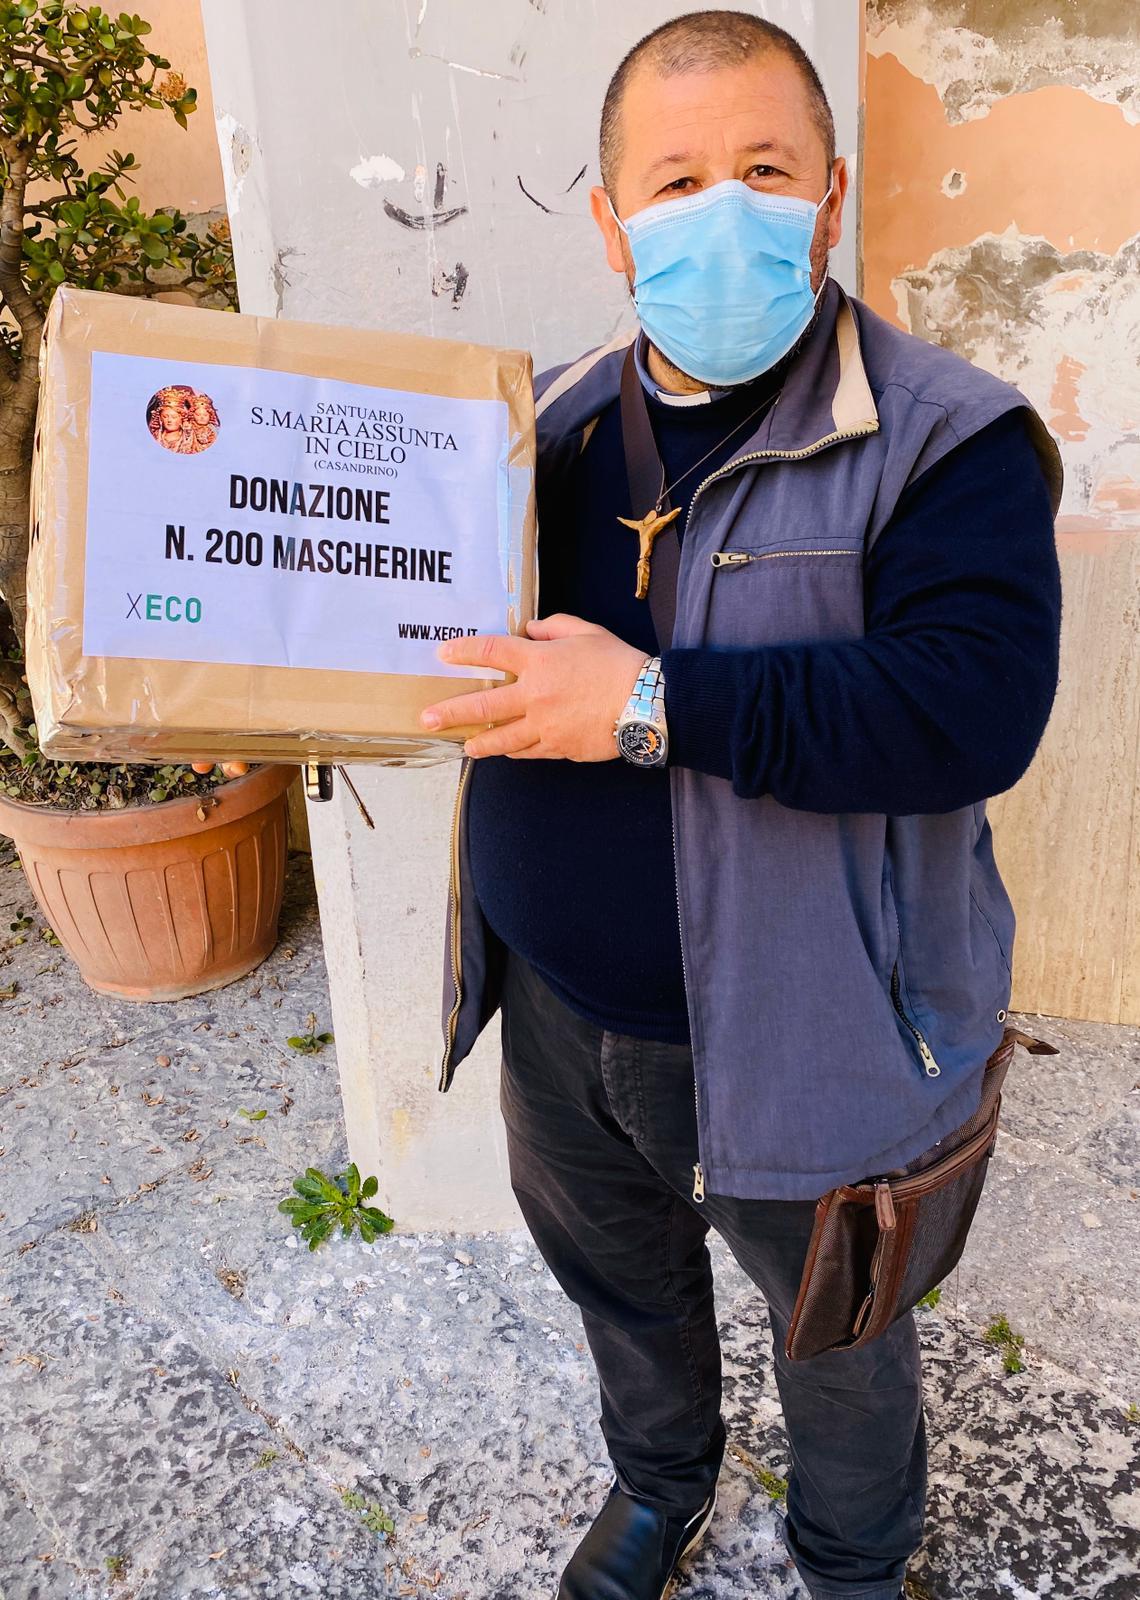 Donate n. 200 mascherine al Santuario di S.Maria Assunta in Cielo